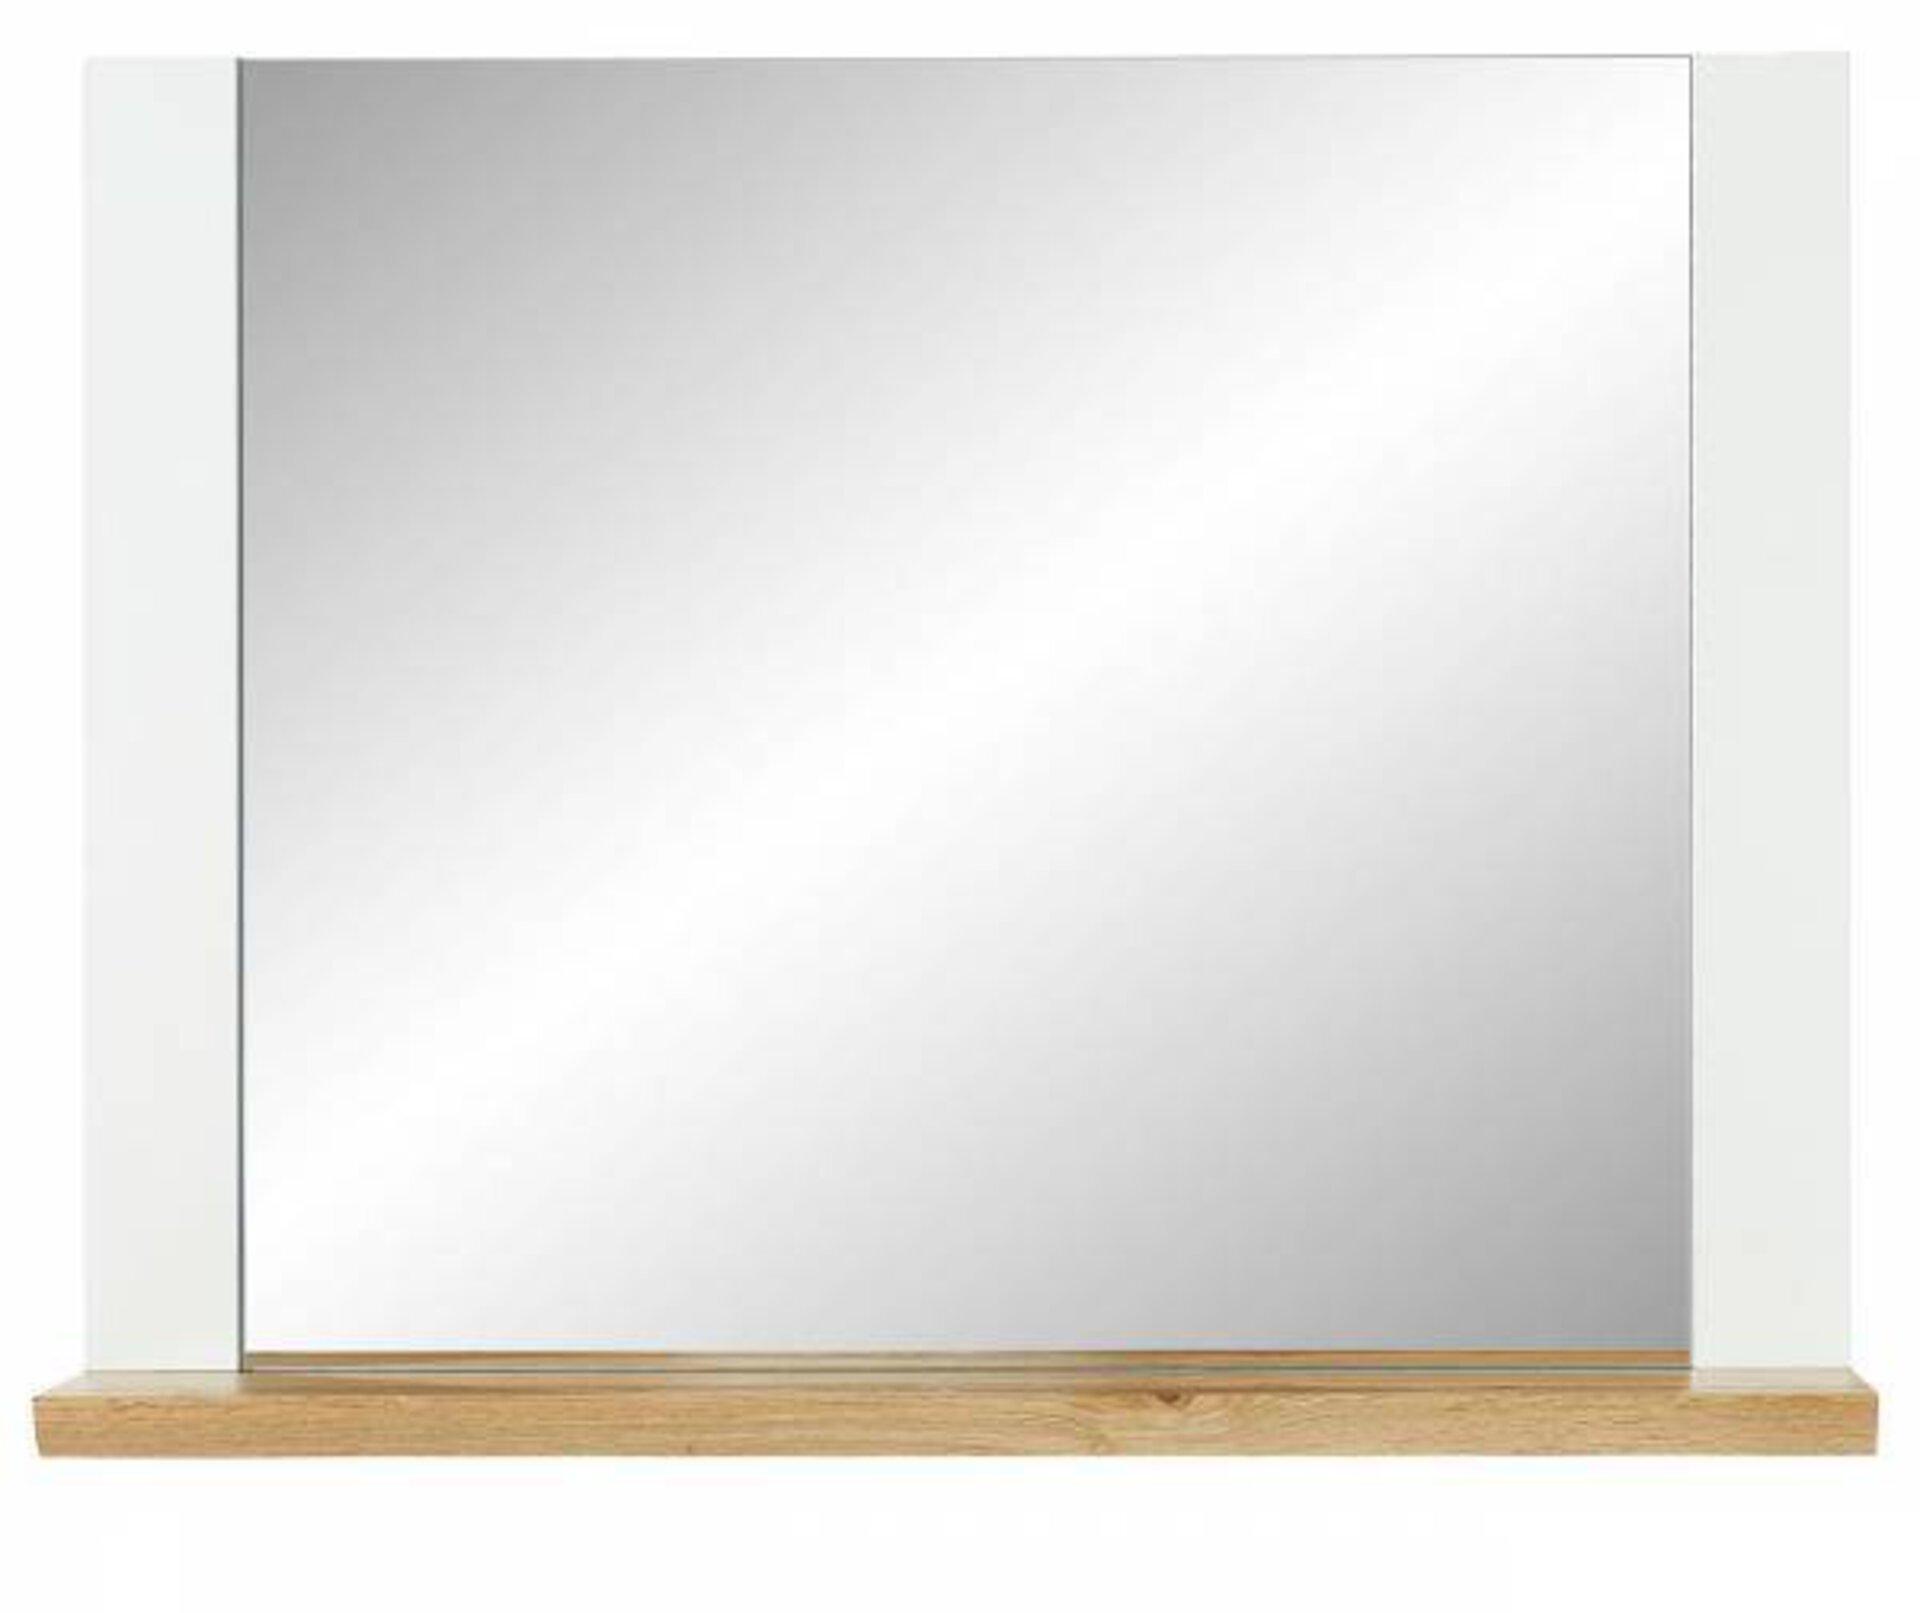 Spiegel MATERIO Vito Holzwerkstoff 14 x 70 x 90 cm